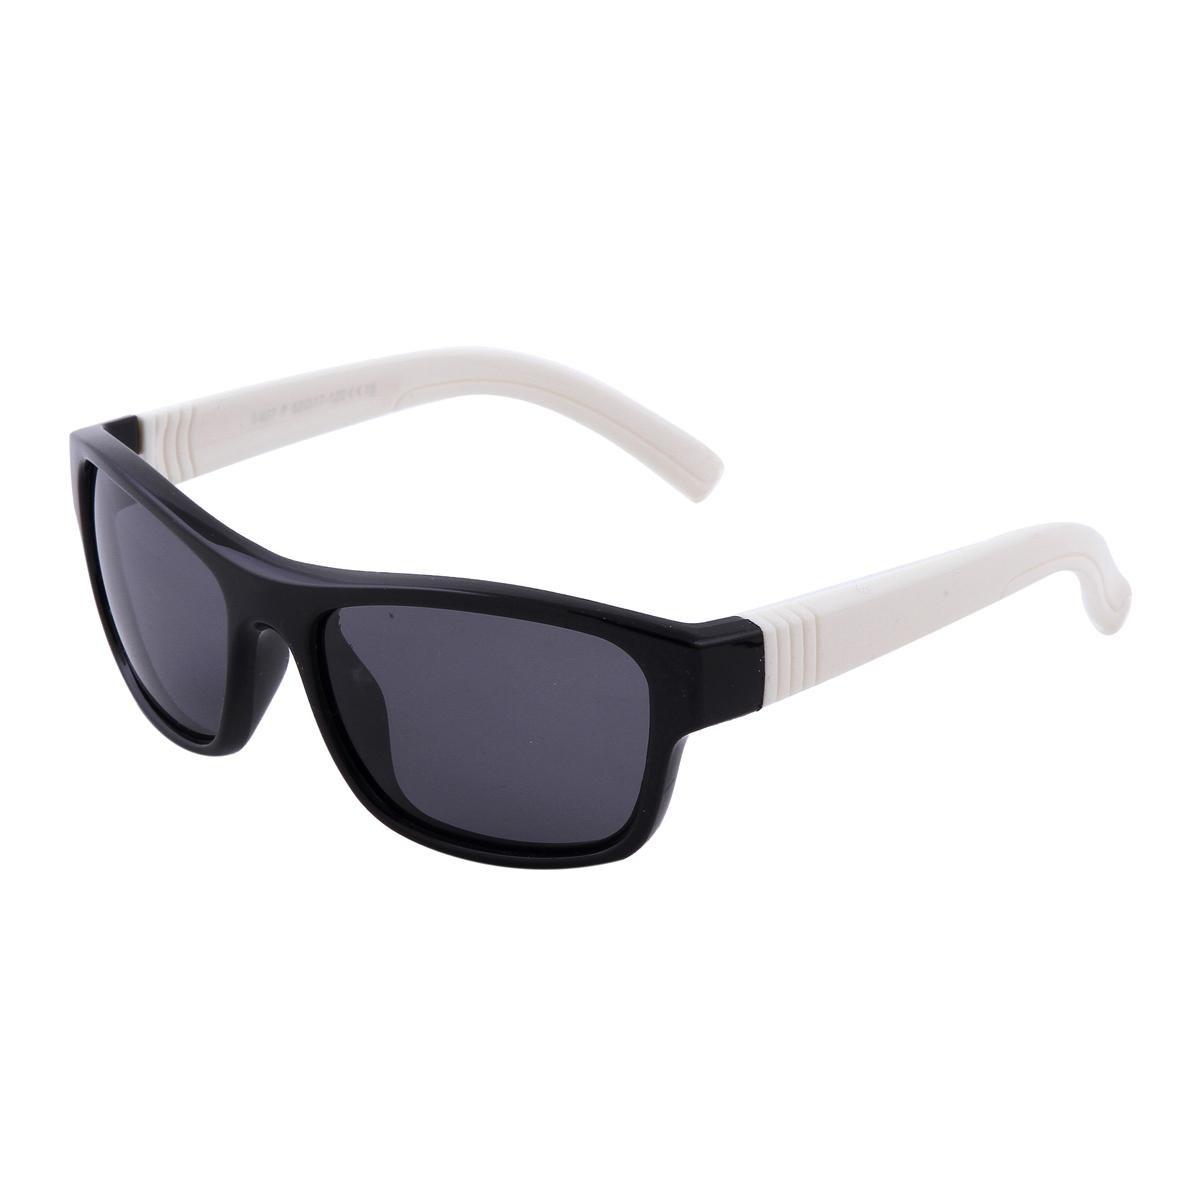 Damara Kid's Plastic Polarized Wayfarer Square Sunglasses,Black-White Frames/Black Lens